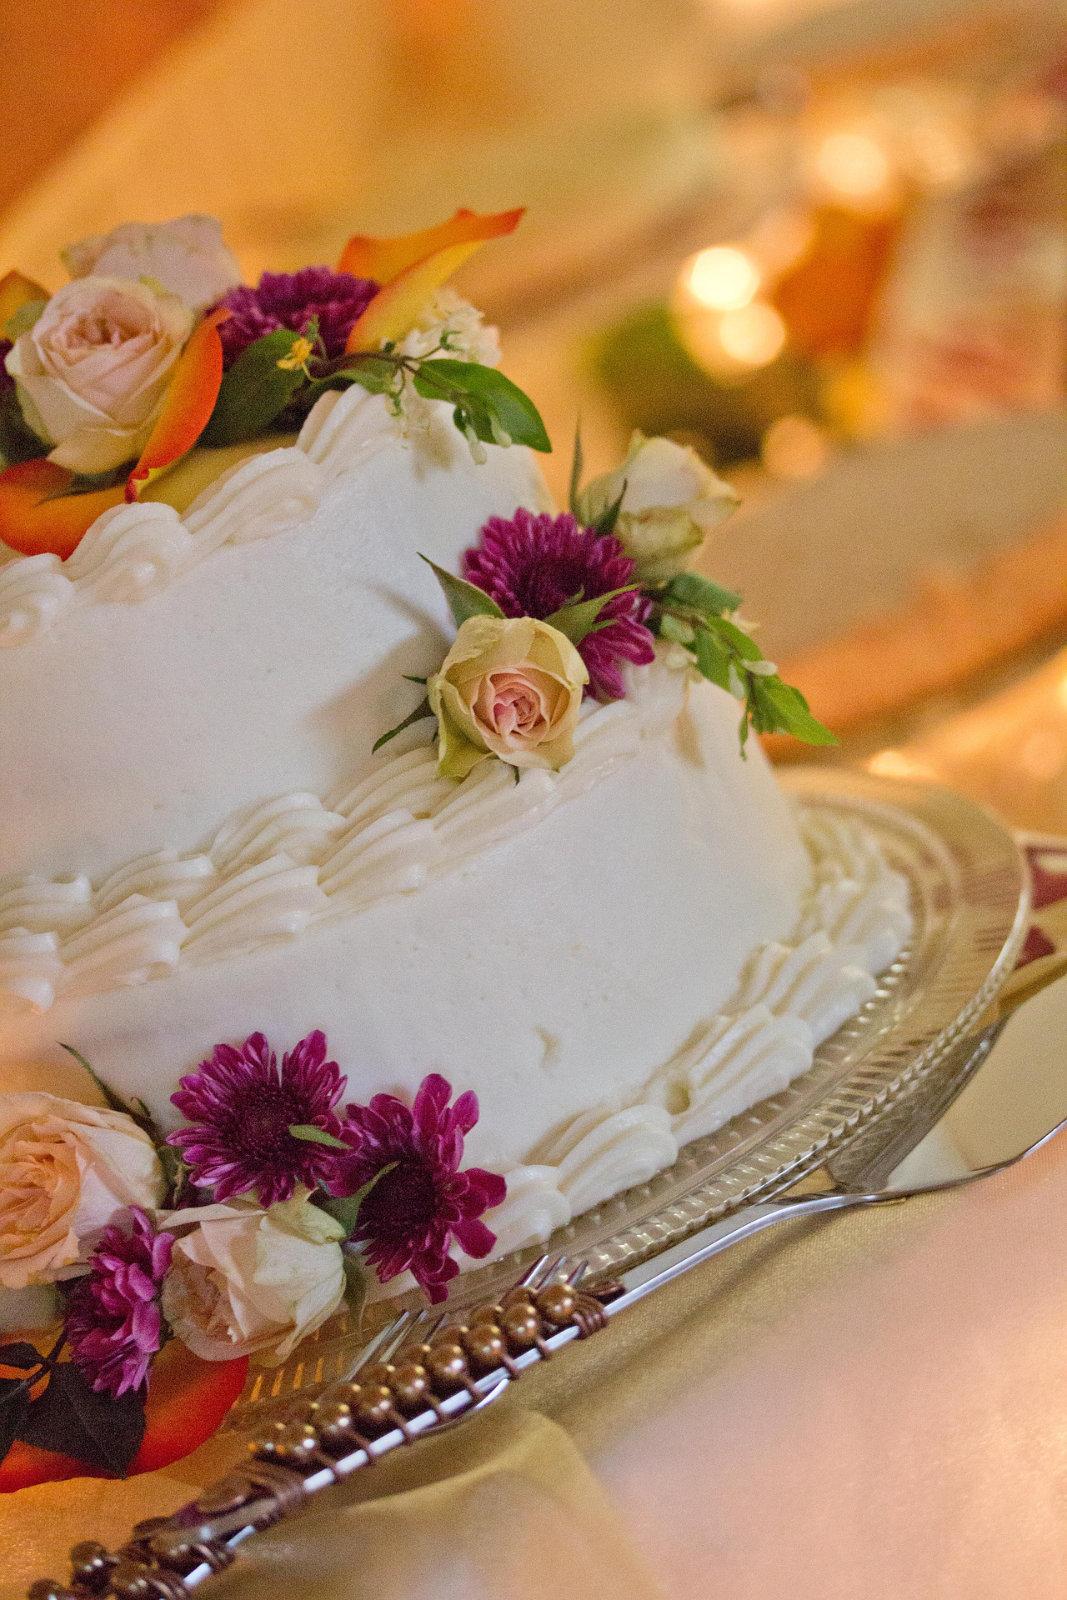 fresh-flowers-wedding-cake.jpg